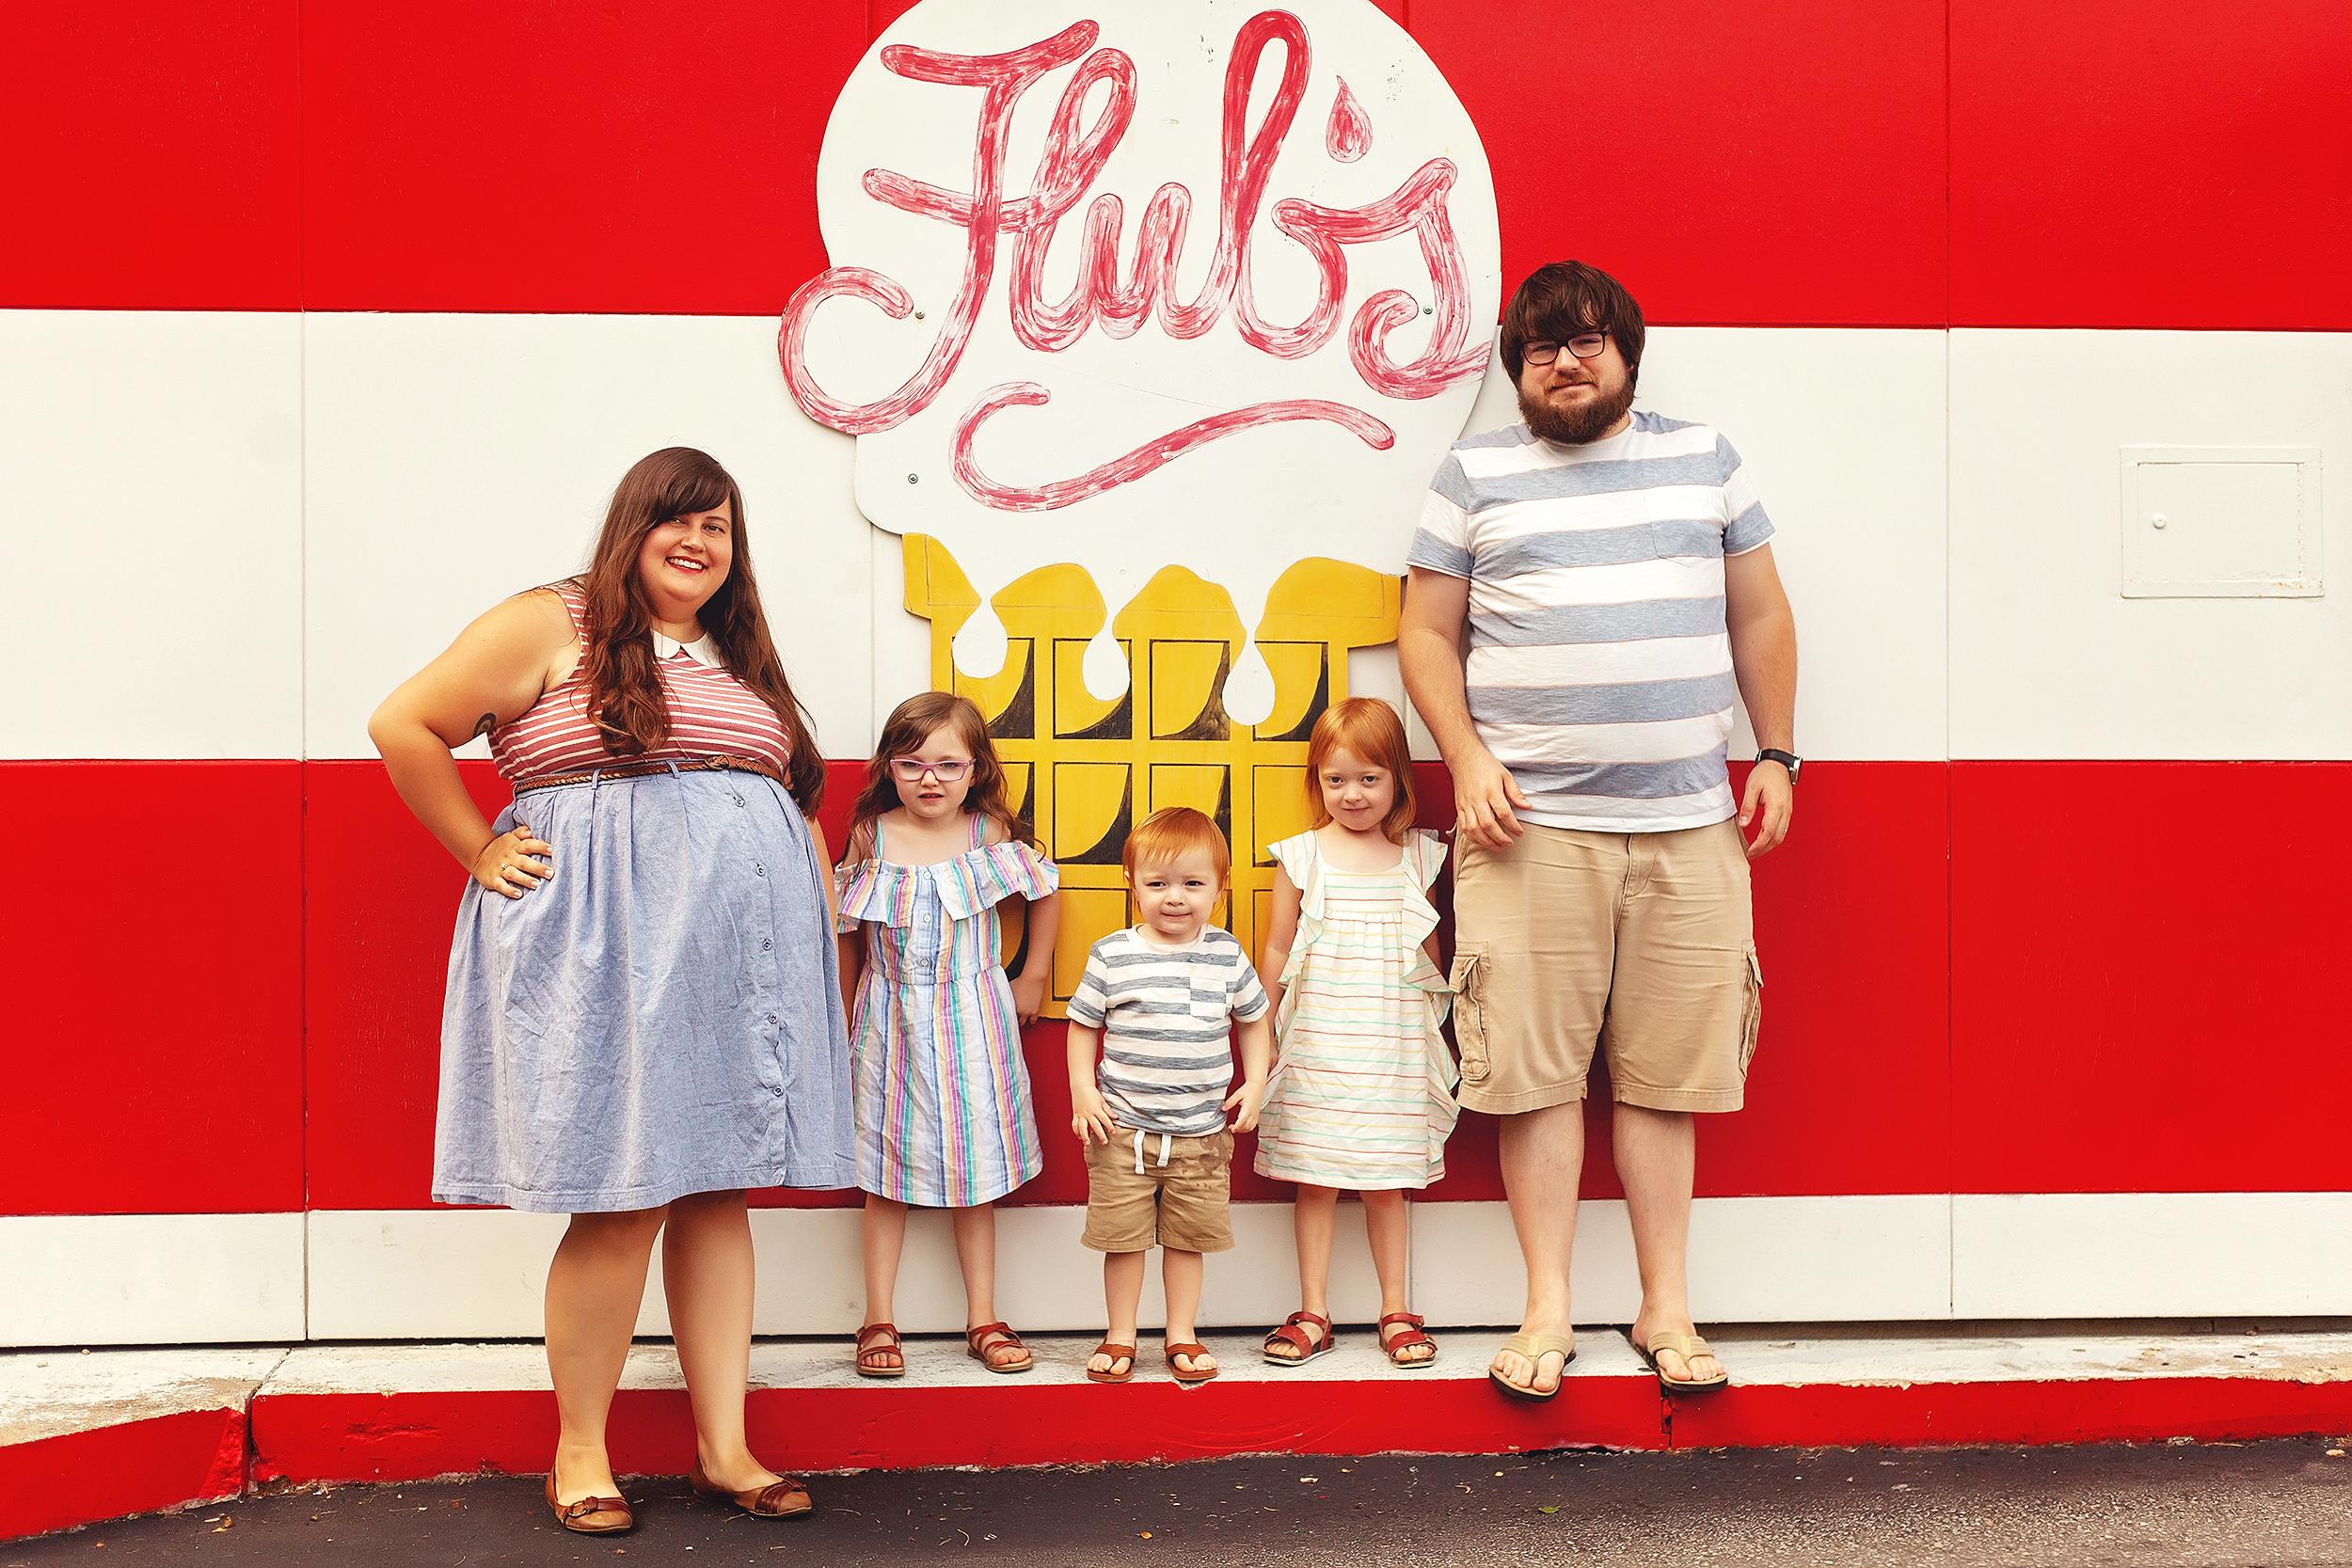 ice-cream-shop-kids-portrait-session-ohio.jpg